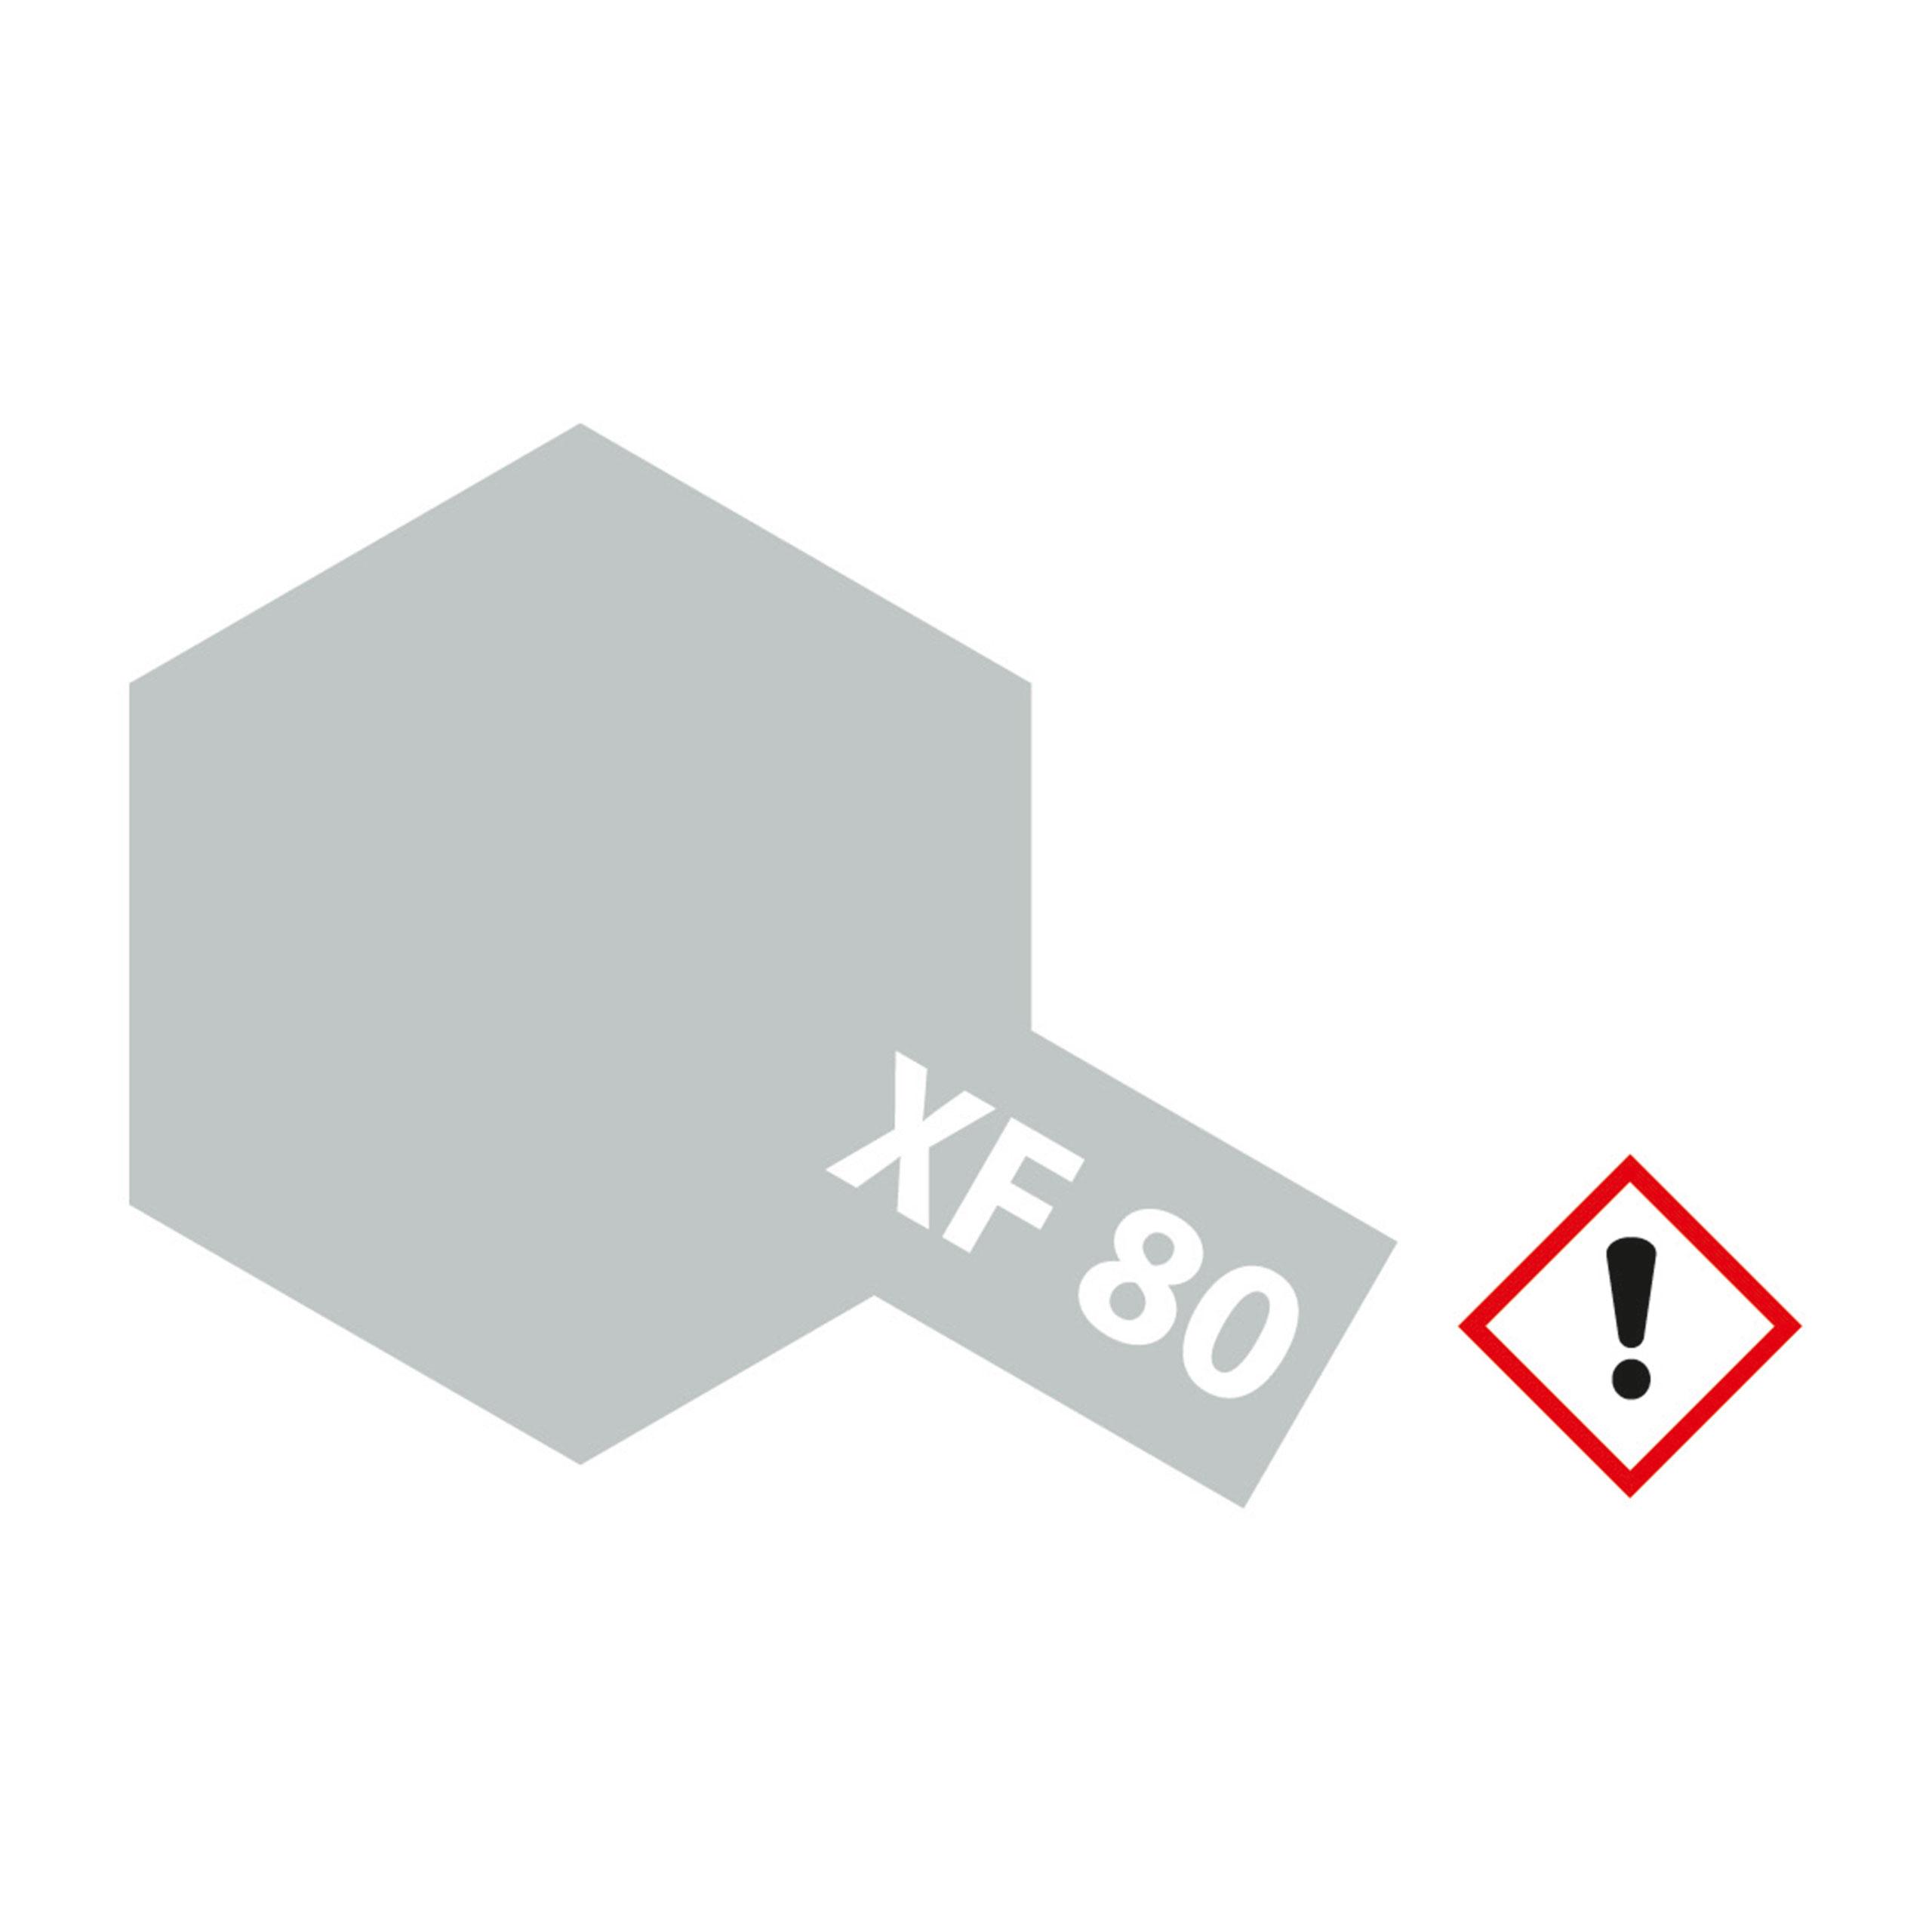 XF-80 Brit. Marine Grau matt - 10ml Acrylstreichfarbe wasserloeslich Tamiya 300081780